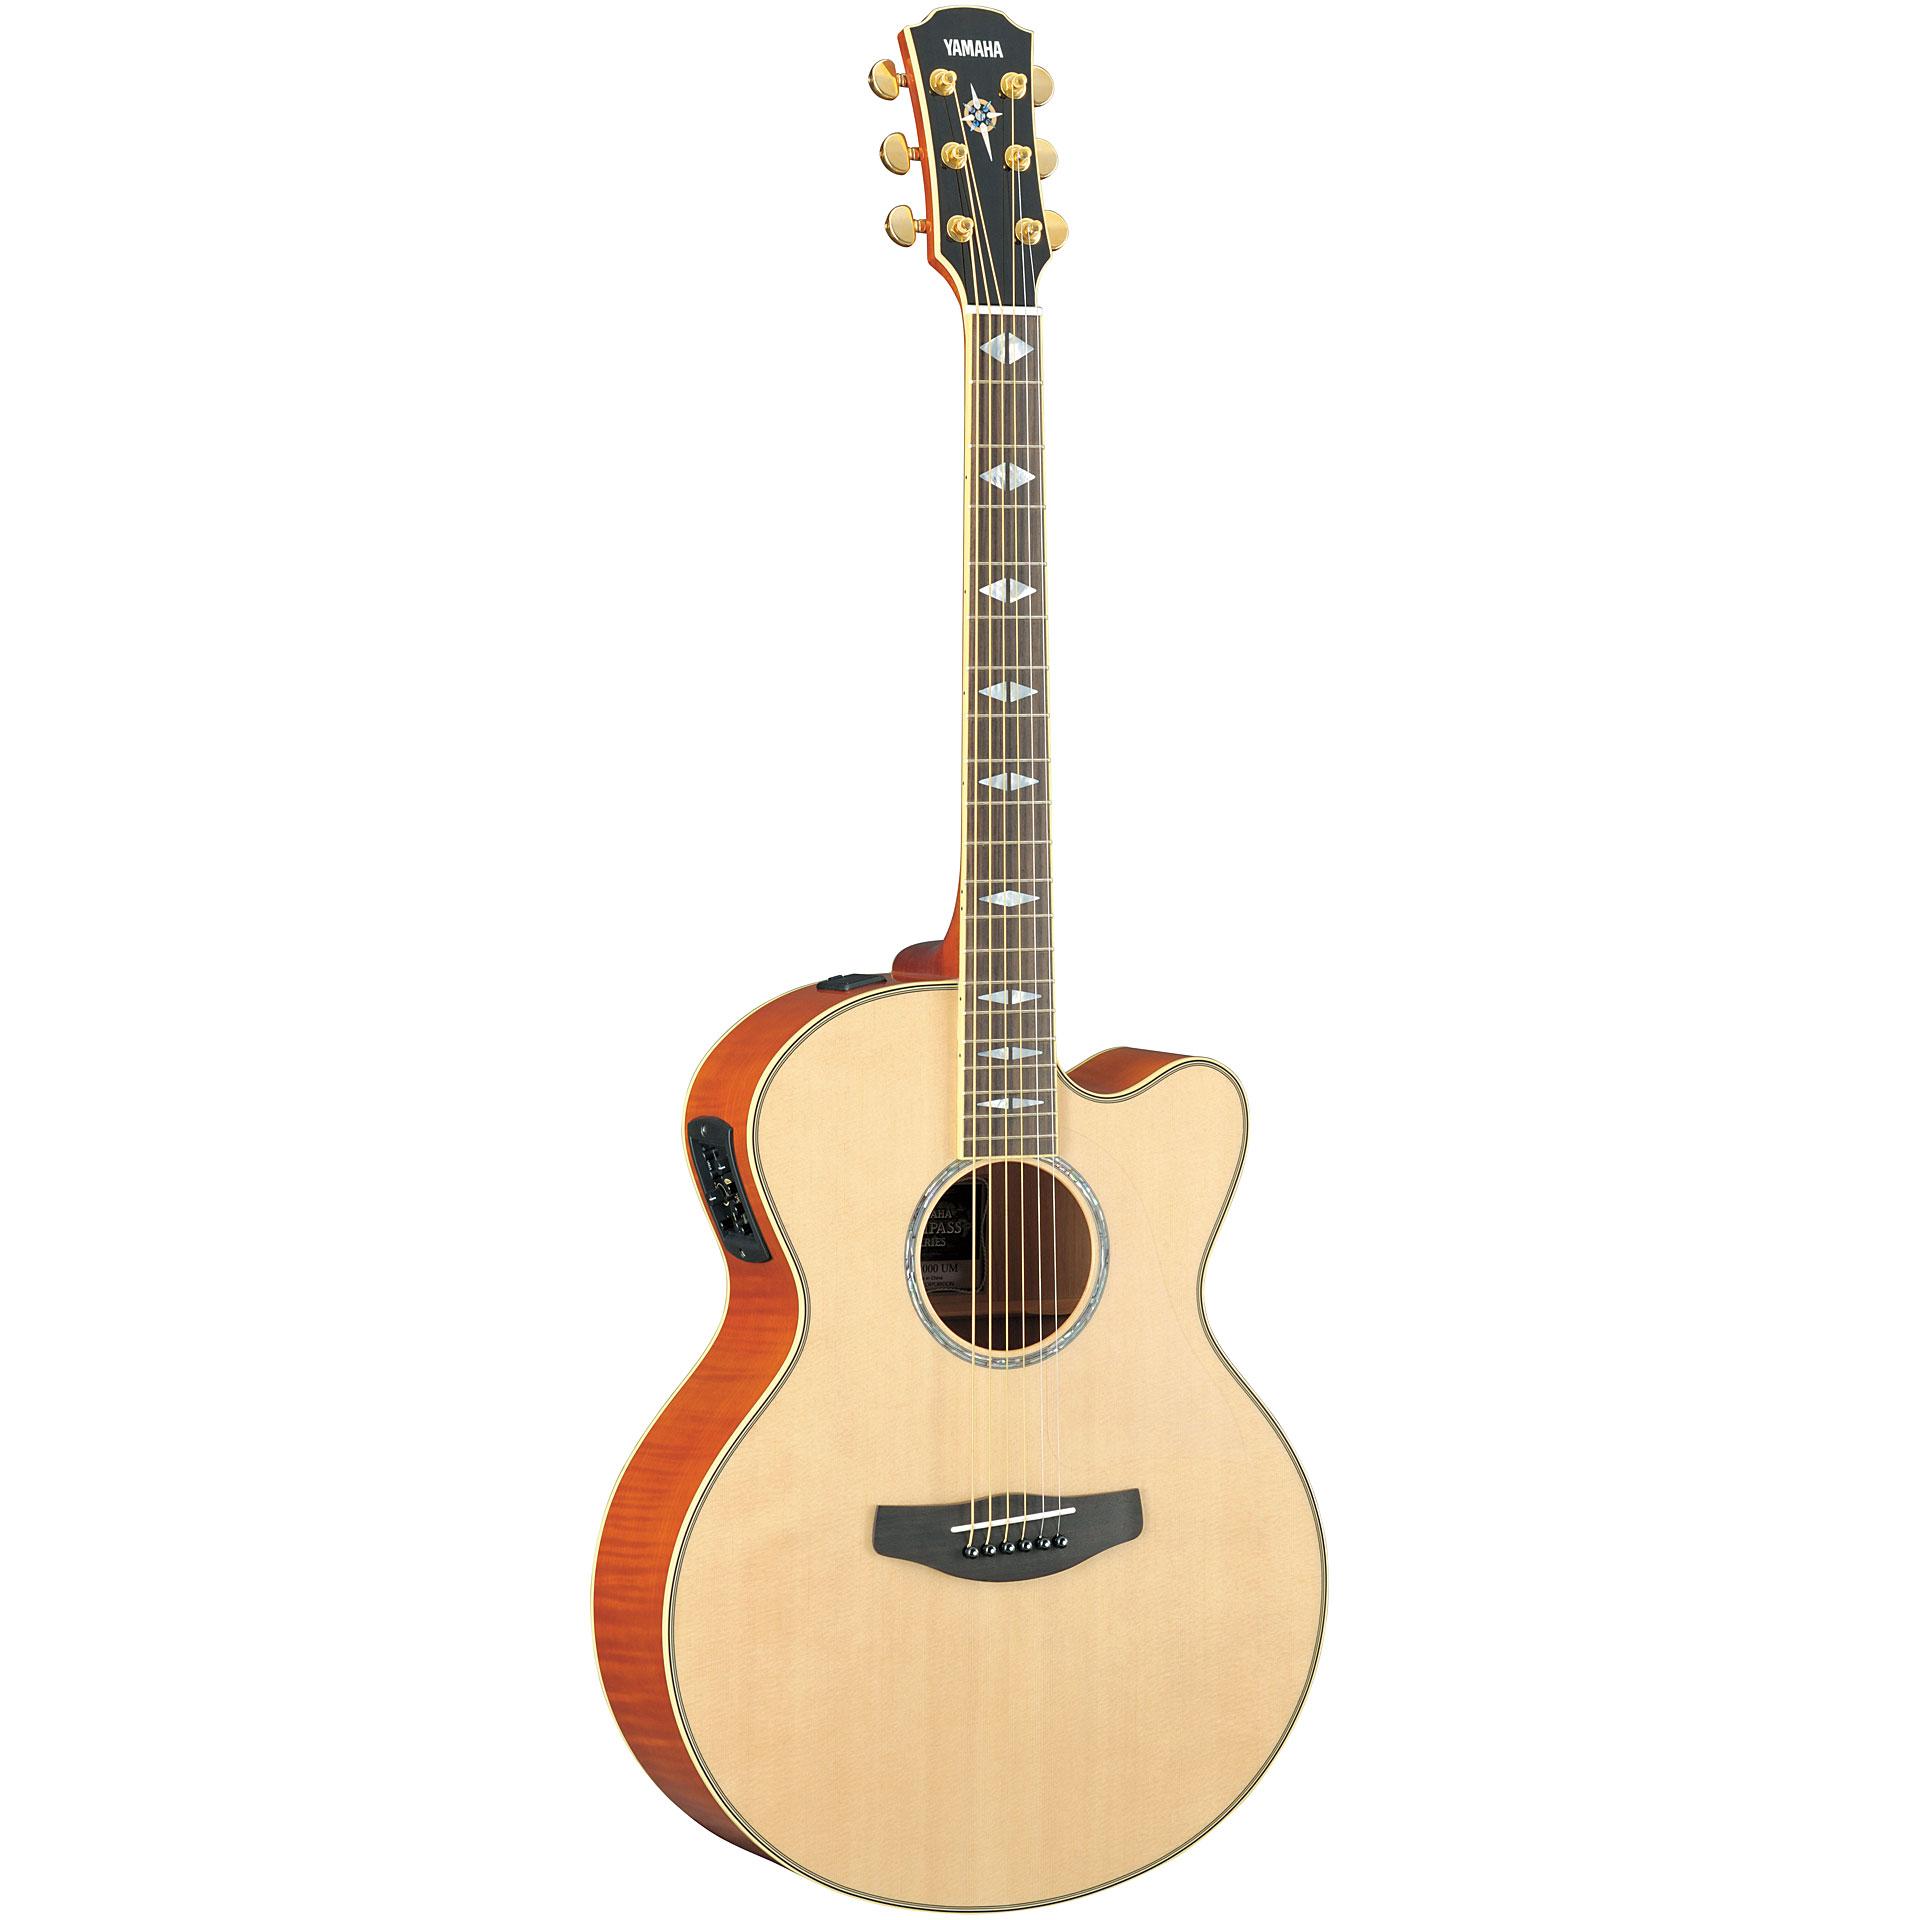 yamaha cpx1000 nt guitare acoustique. Black Bedroom Furniture Sets. Home Design Ideas